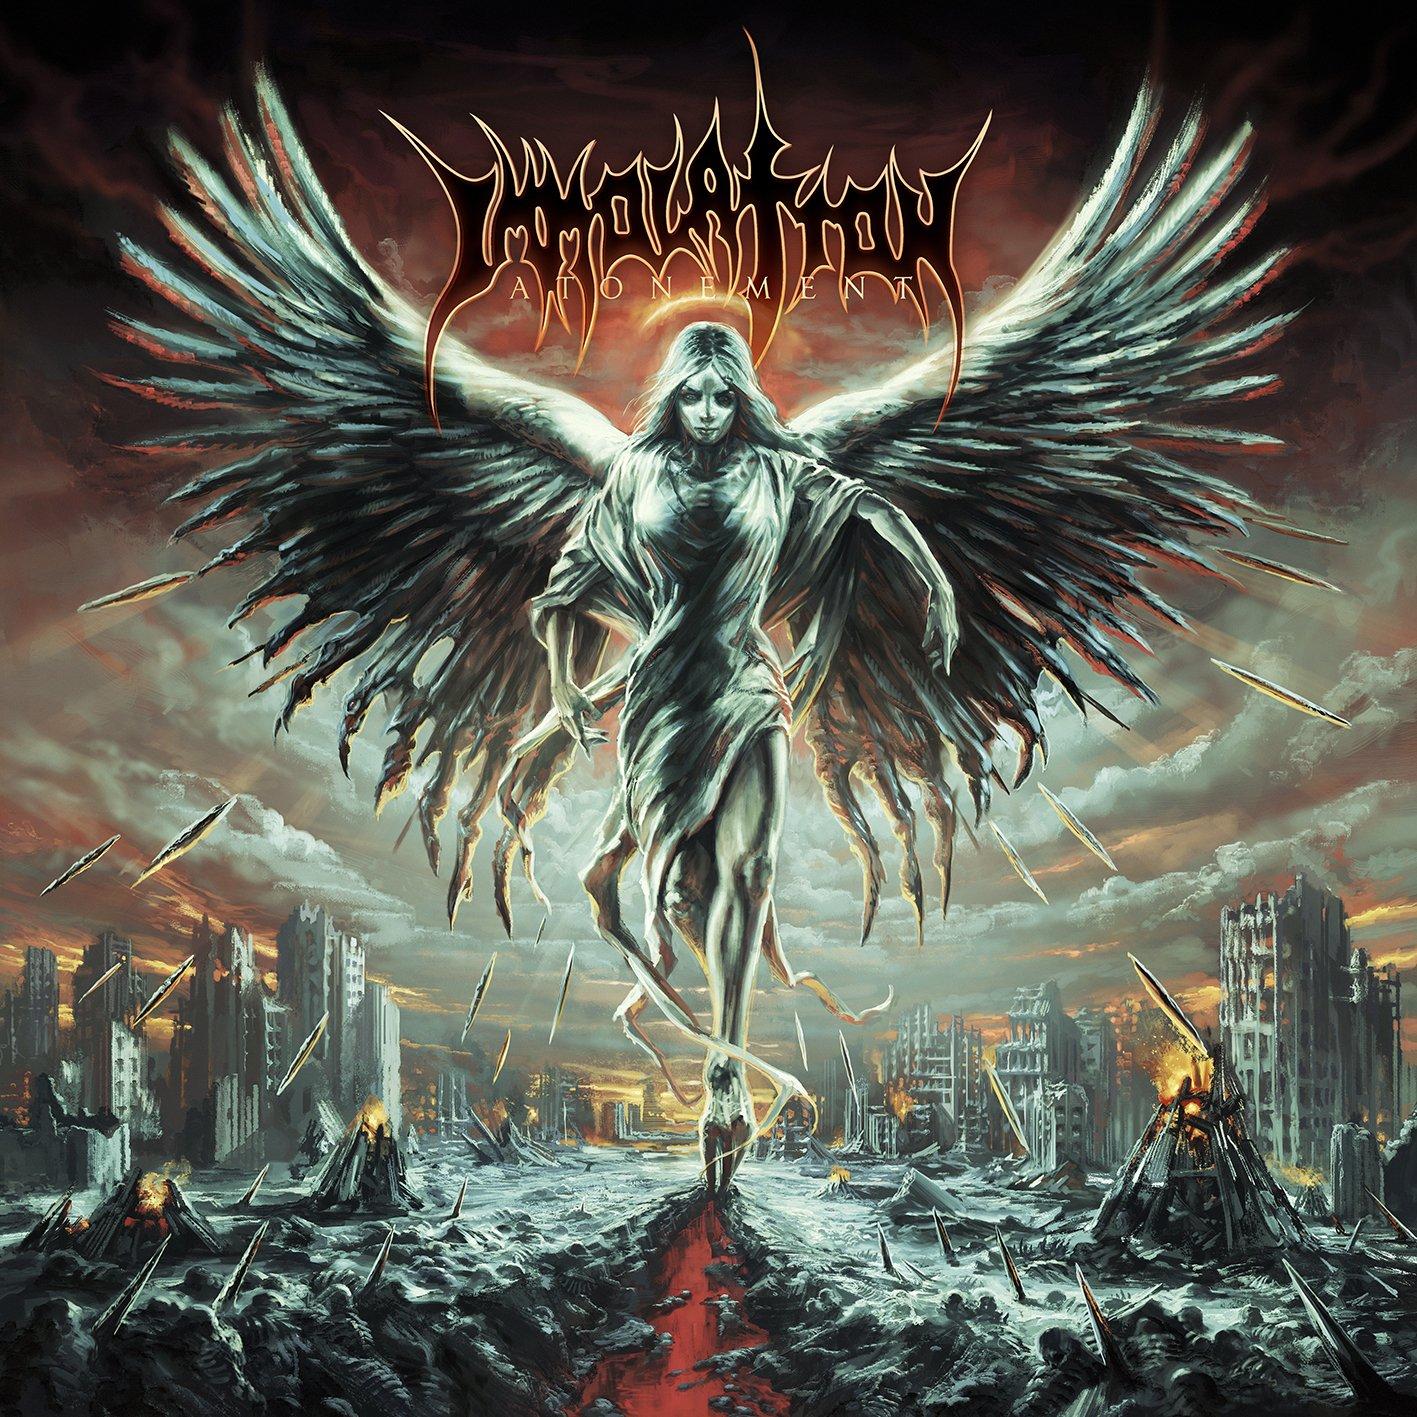 CD : Immolation - Atonement (CD)